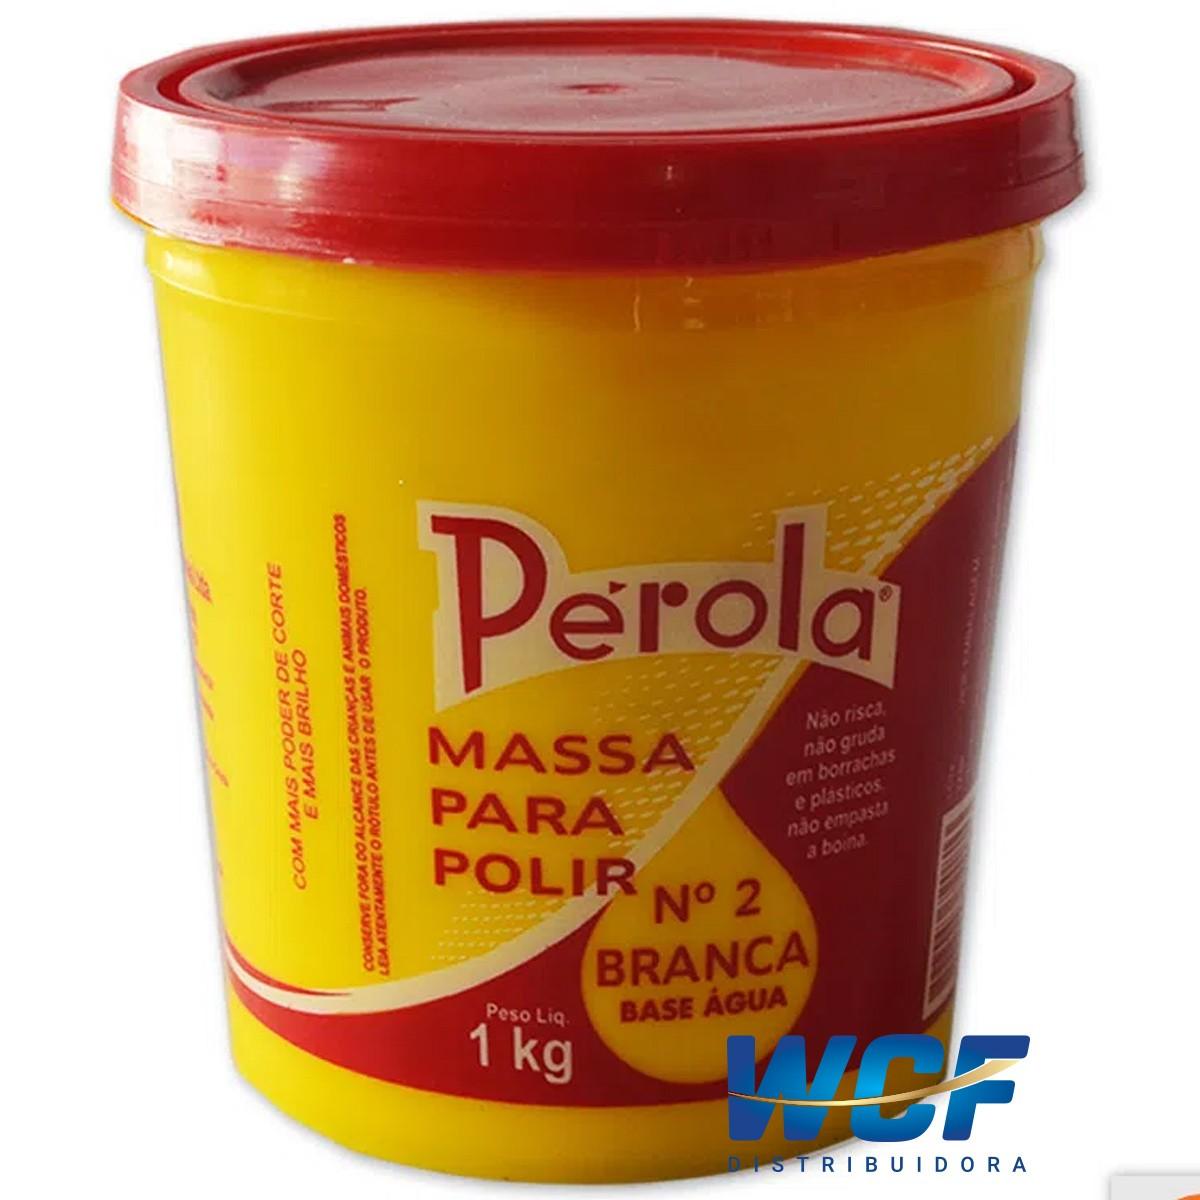 PEROLA MASSA DE POLIR N2 BASE AGUA 1KG